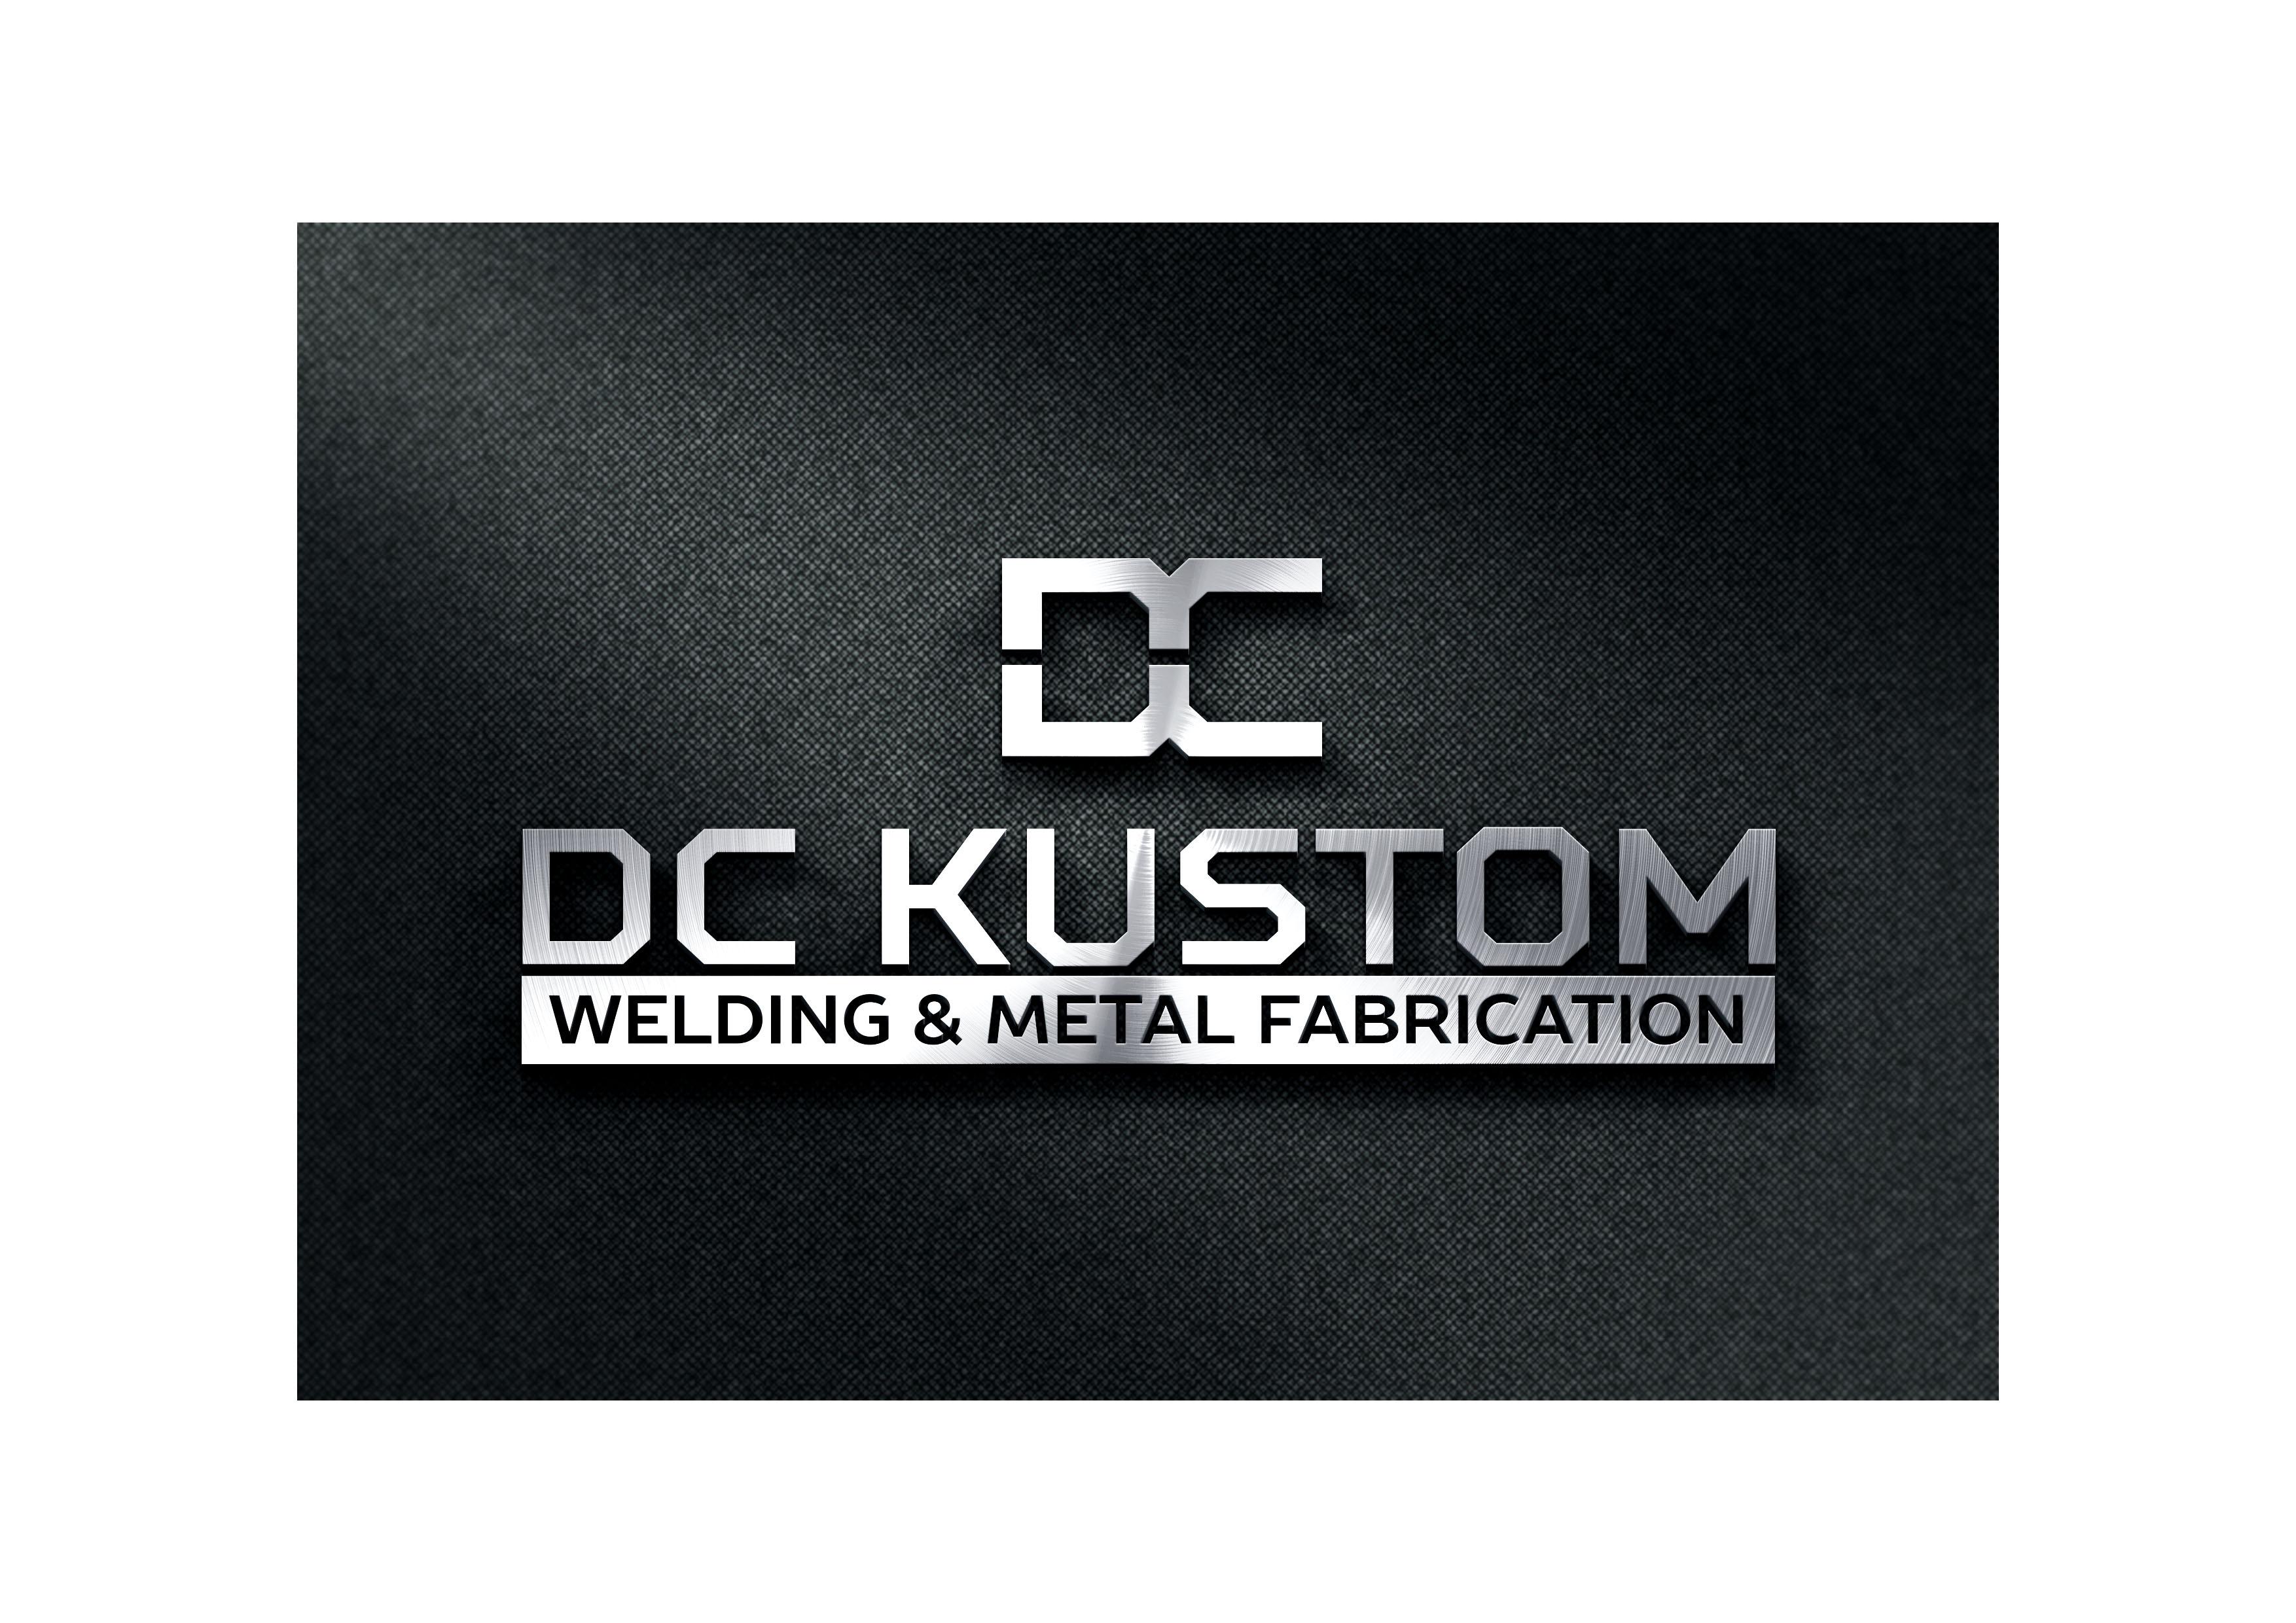 Logo Design by demang - Entry No. 140 in the Logo Design Contest Imaginative Logo Design for DC KUSTOM WELDING & METAL FABRICATION.